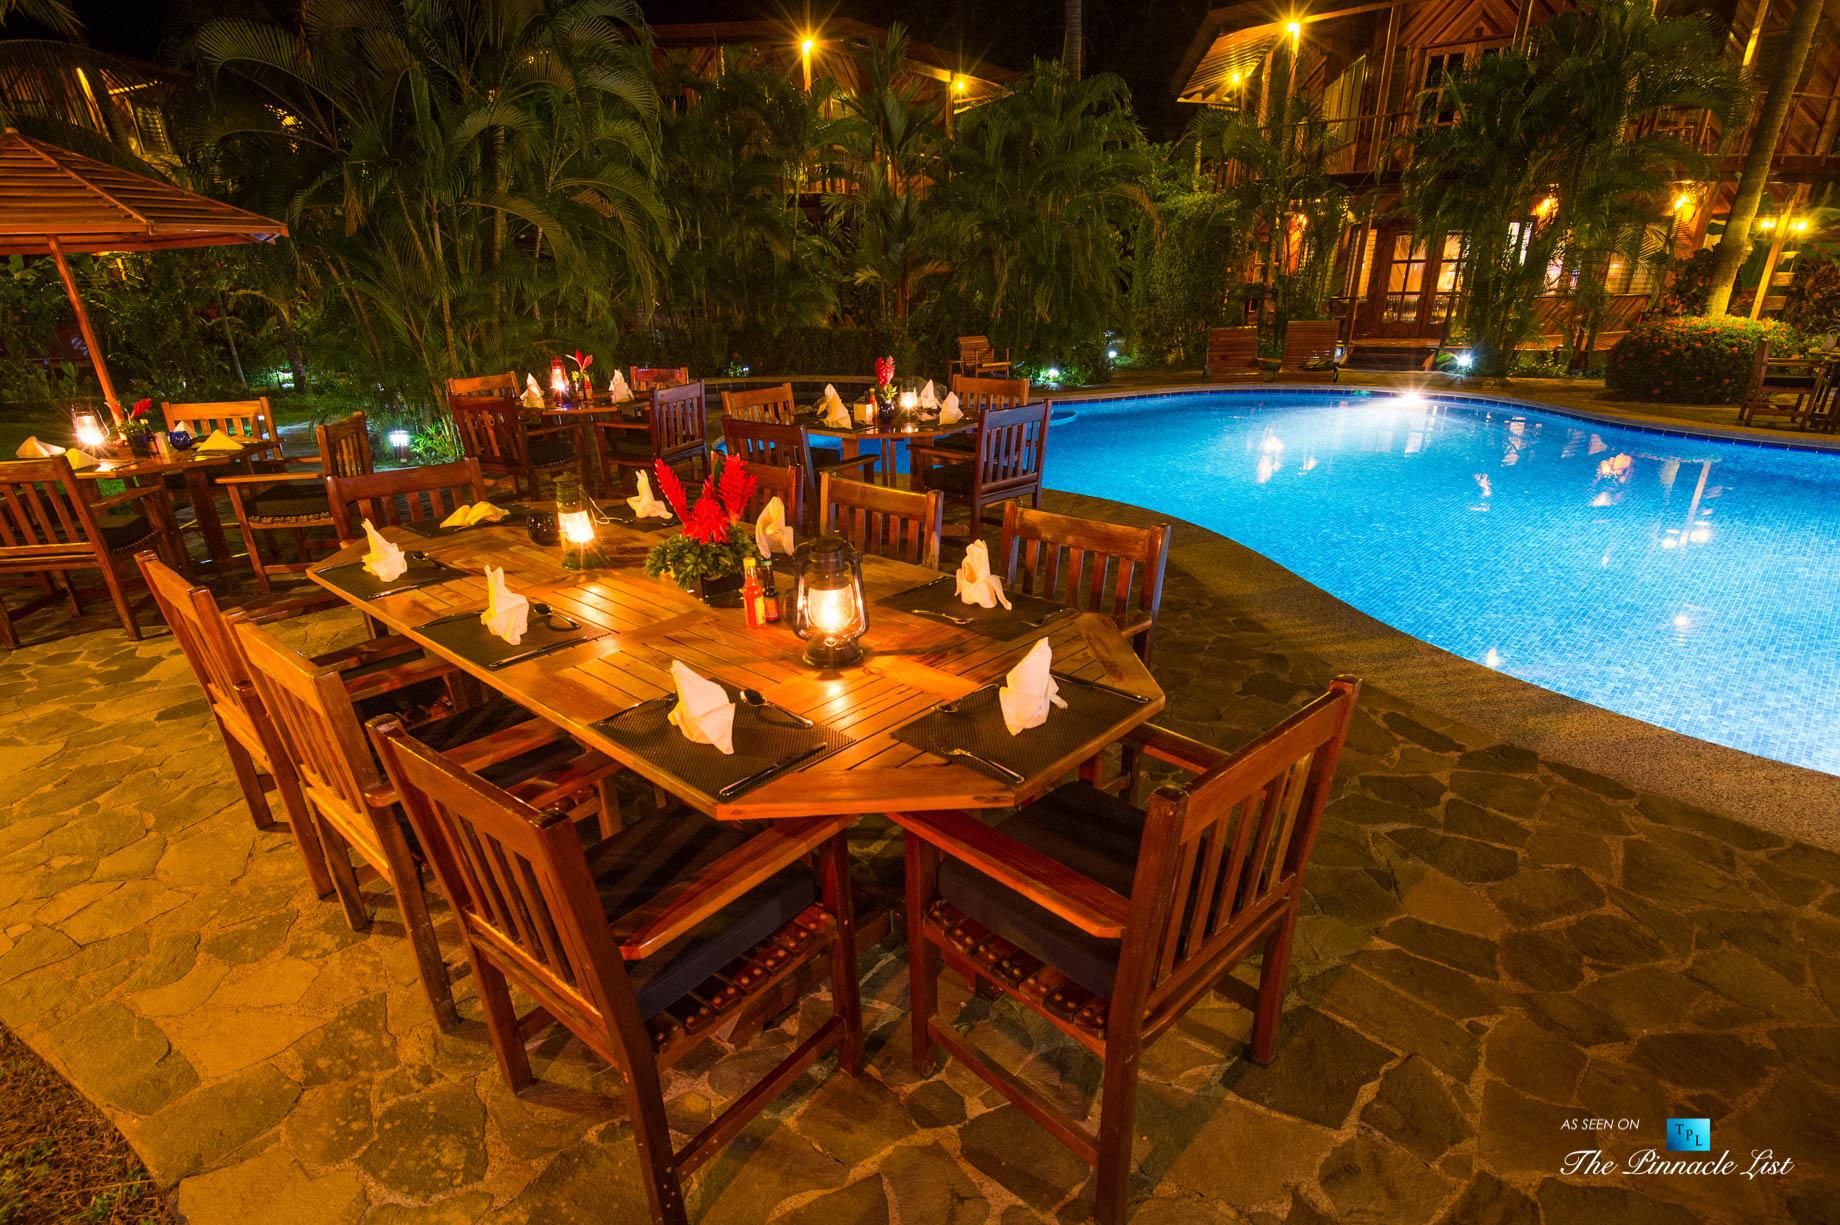 Tambor Tropical Beach Resort Puntarenas Costa Rica Poolside Restaurant At Night